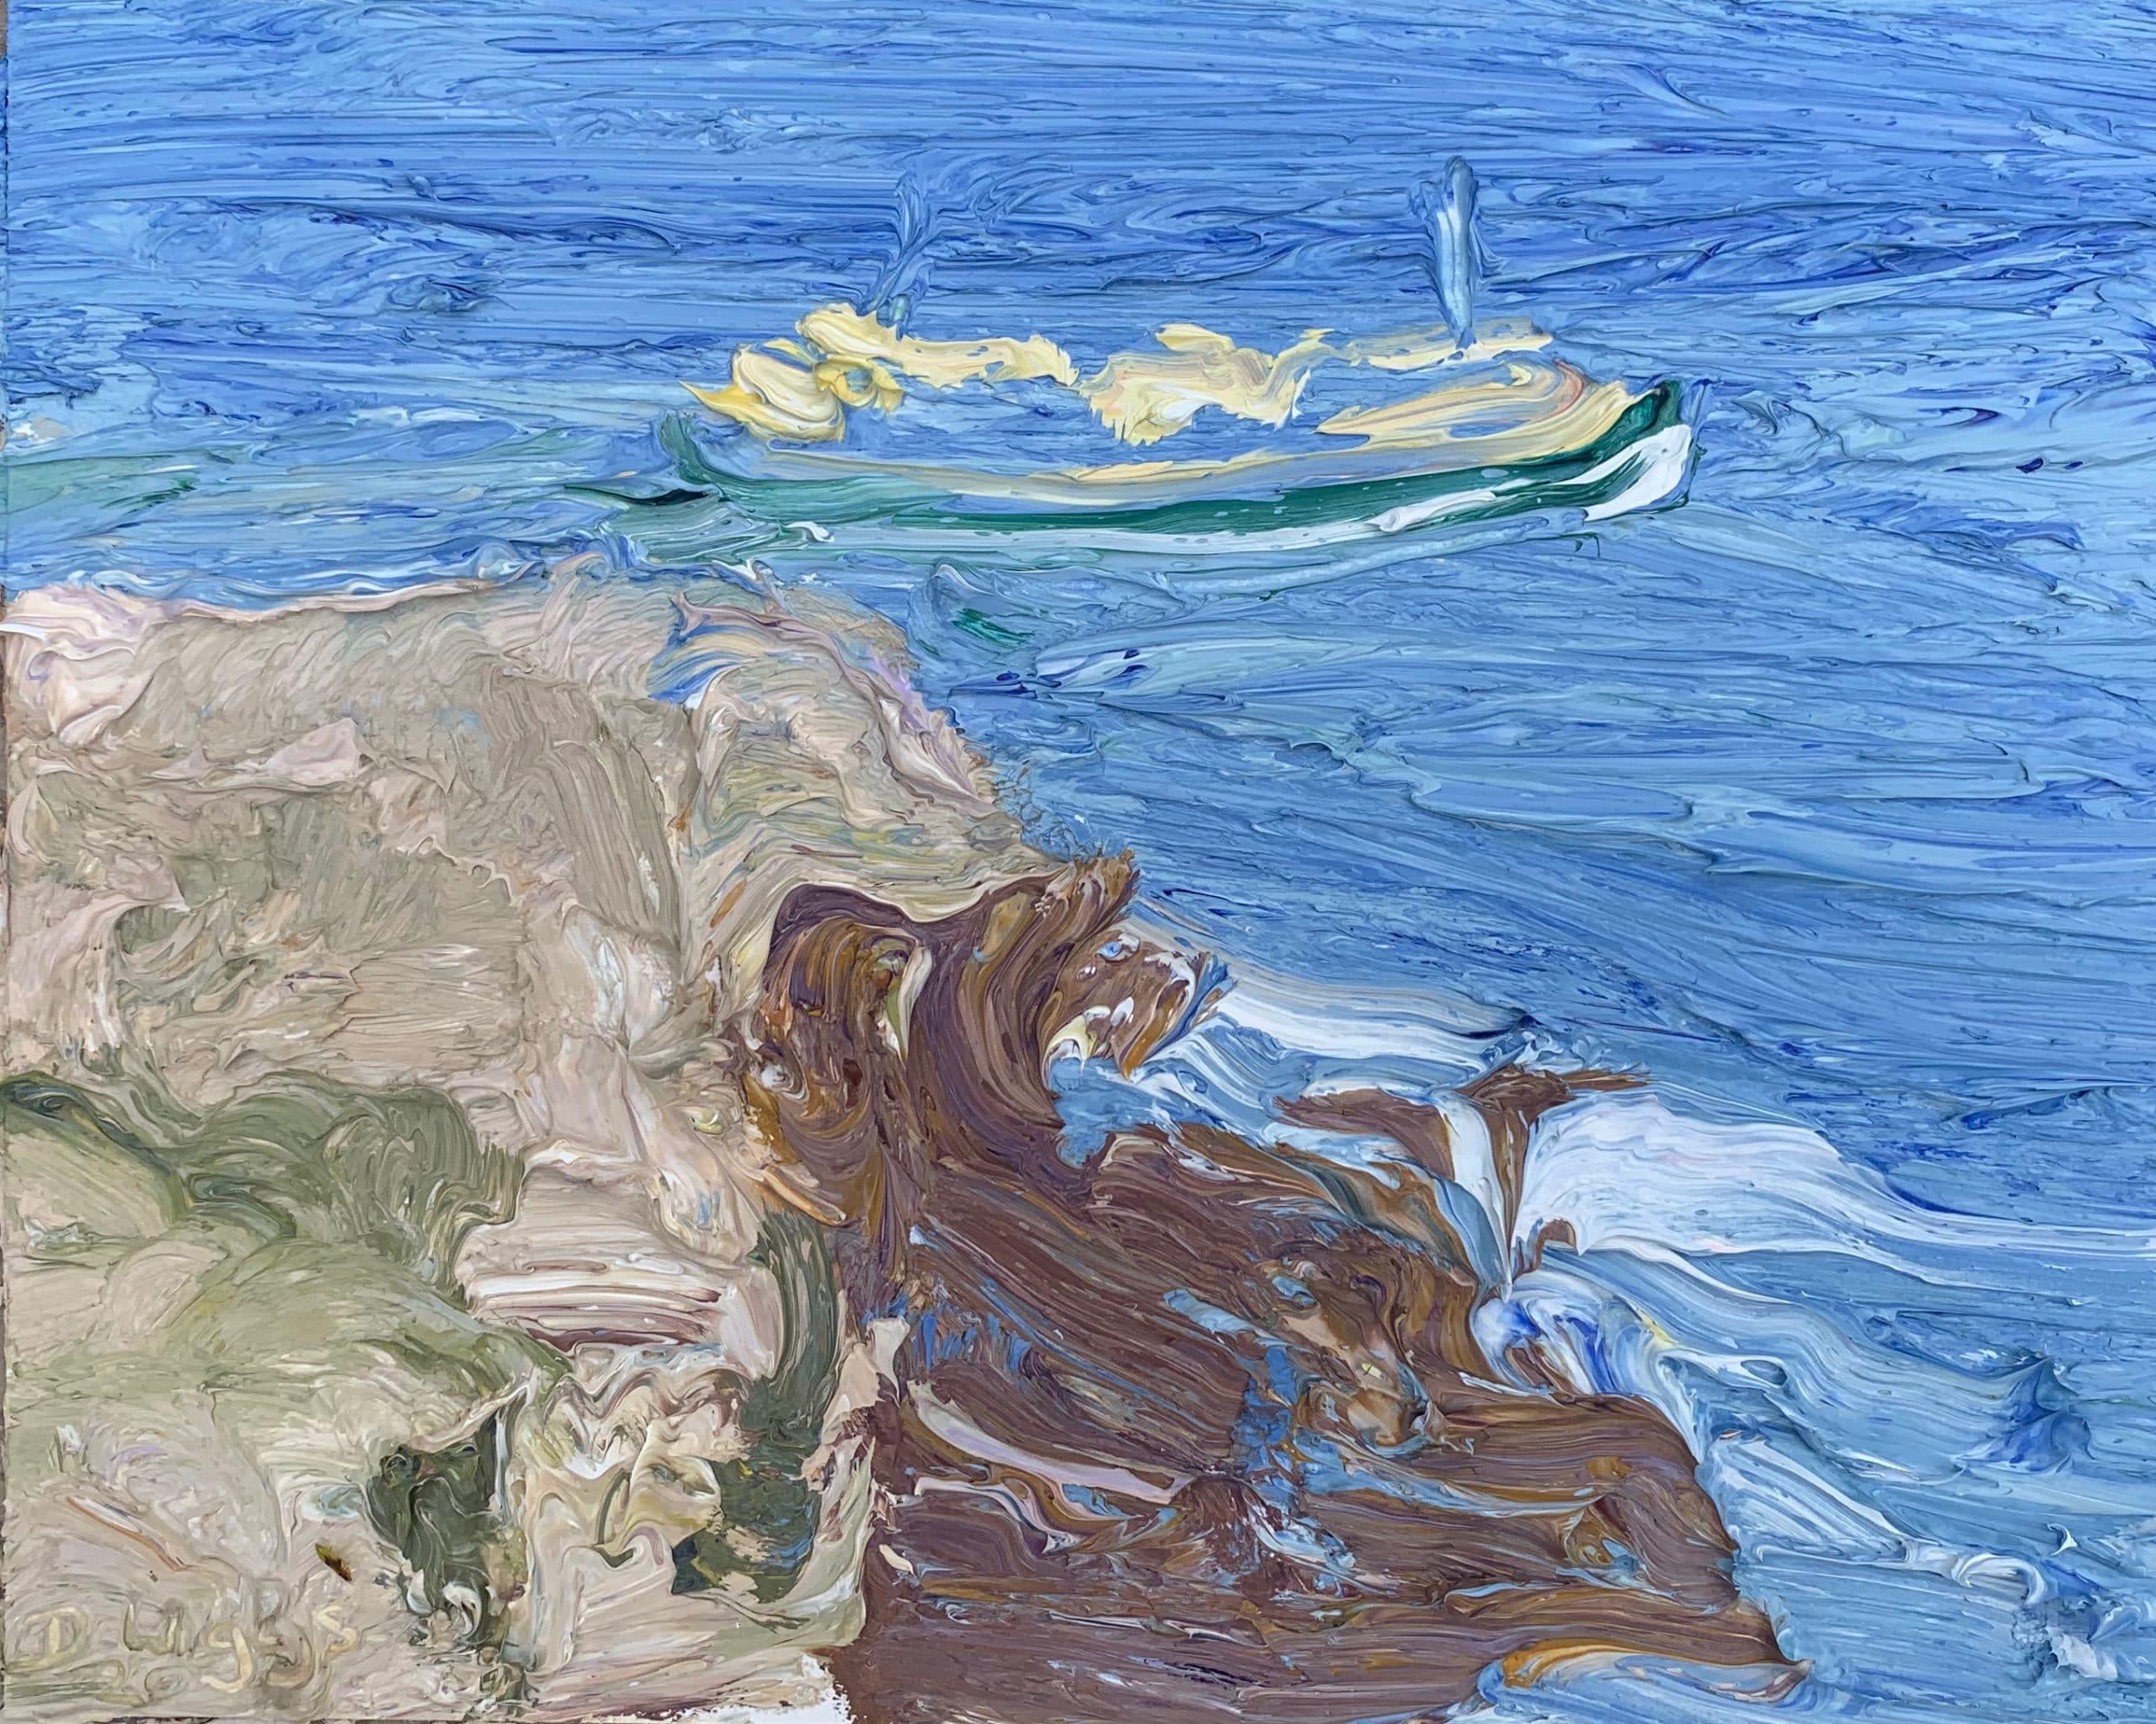 Past Dobroyd-Plein air-Oil on oil paper-50cm x 55cm framed-David K Wiggs 2020